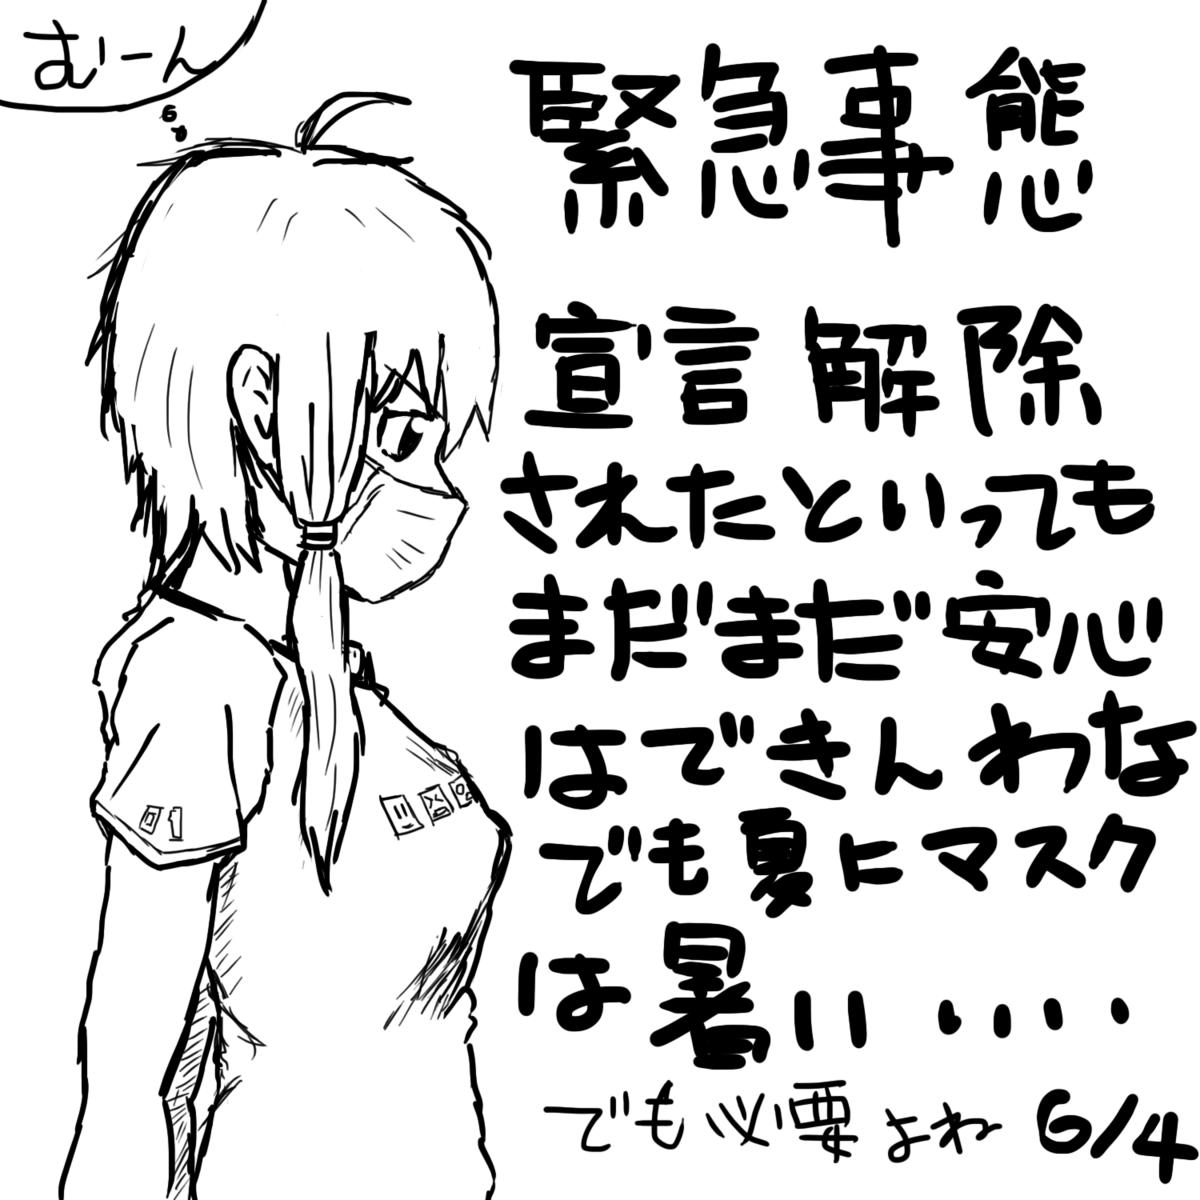 f:id:zomuzomu:20200604115921p:plain